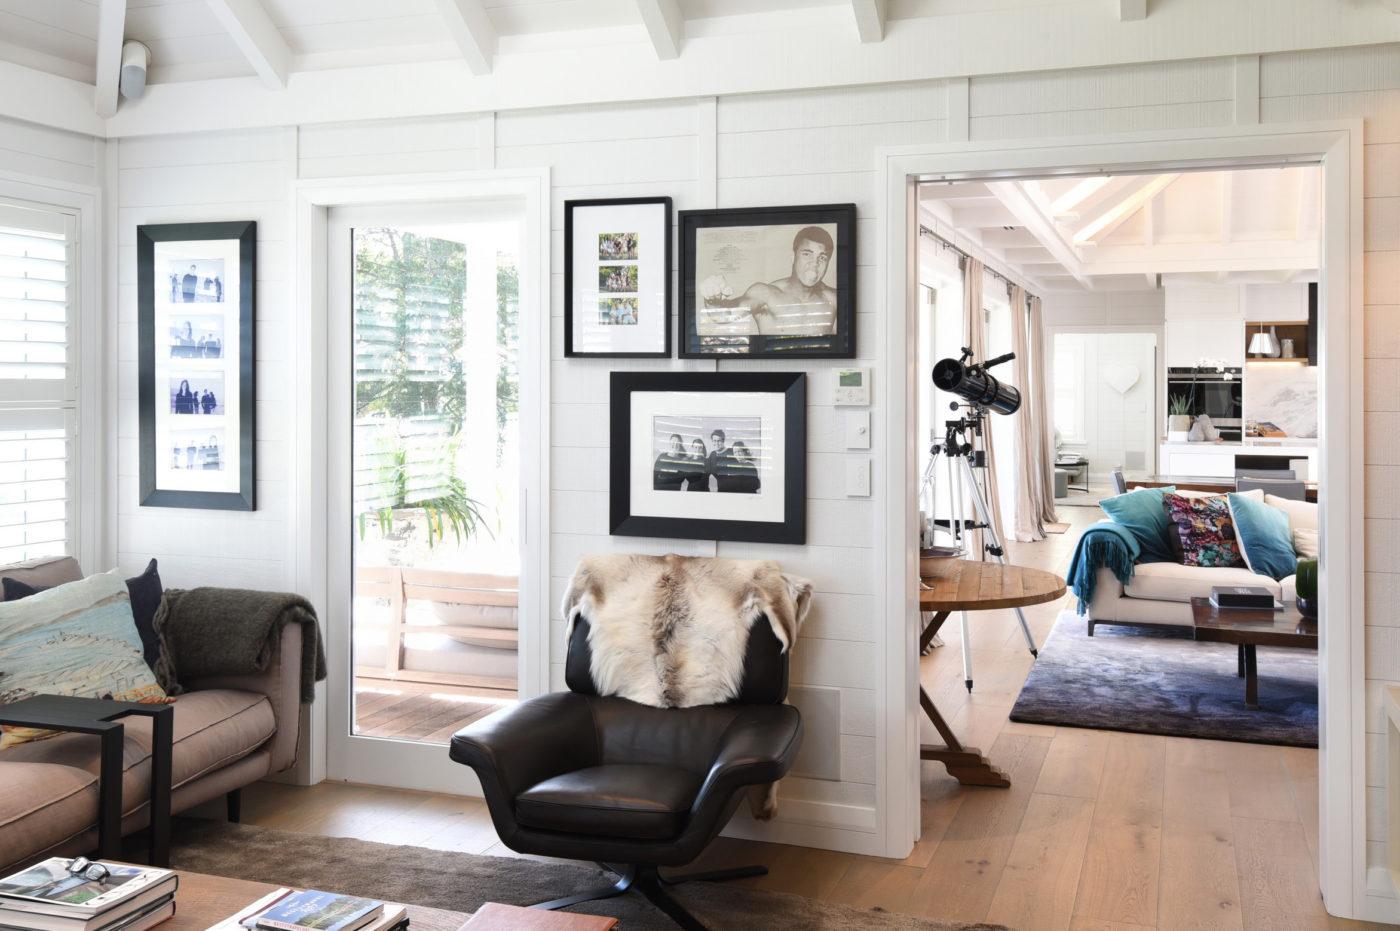 Sandspit House Sumich Chaplin Architects